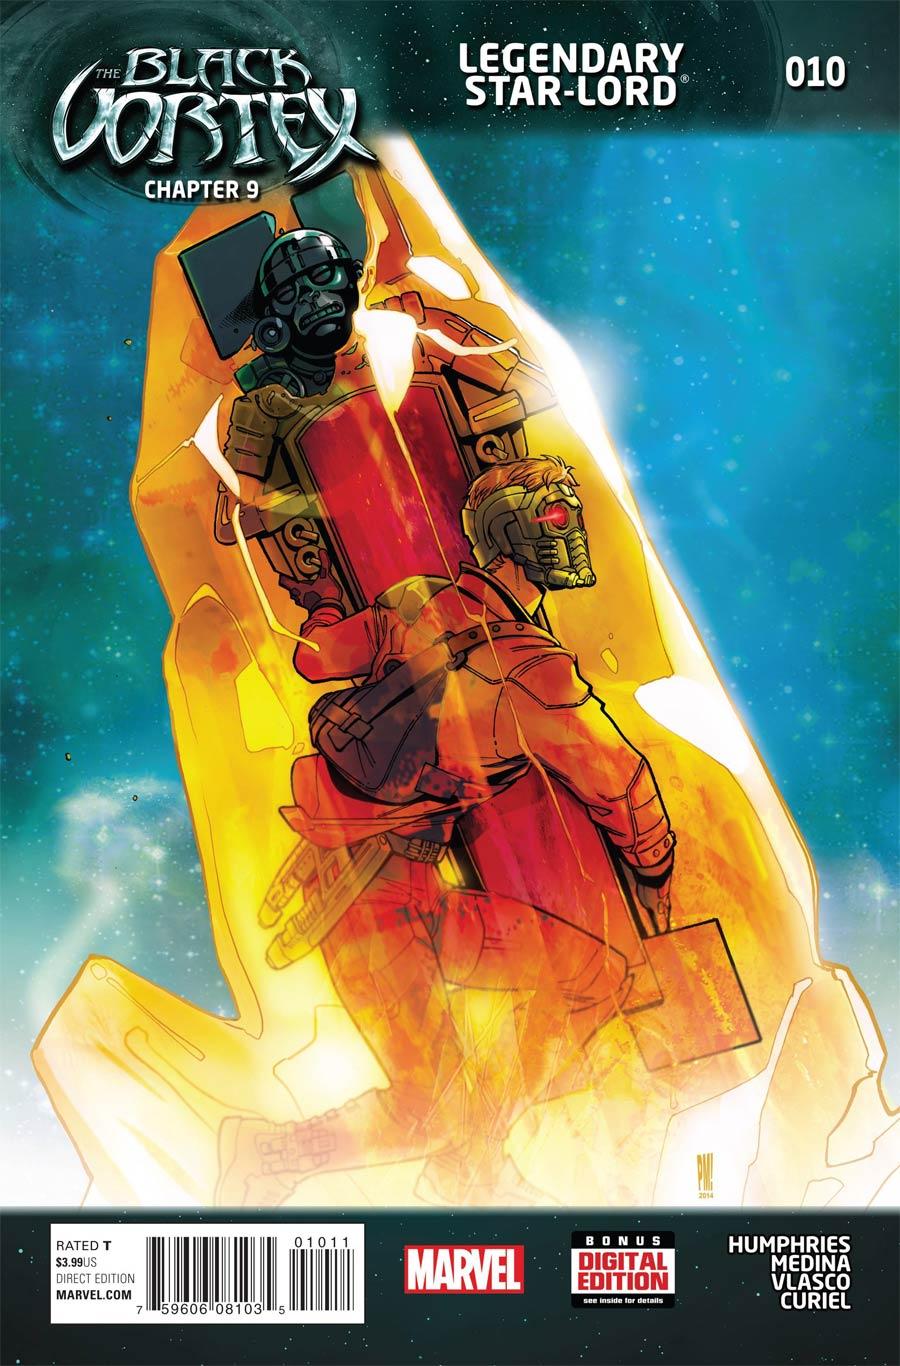 Legendary Star-Lord #10 Cover A Regular Paco Medina Cover (Black Vortex Part 9)